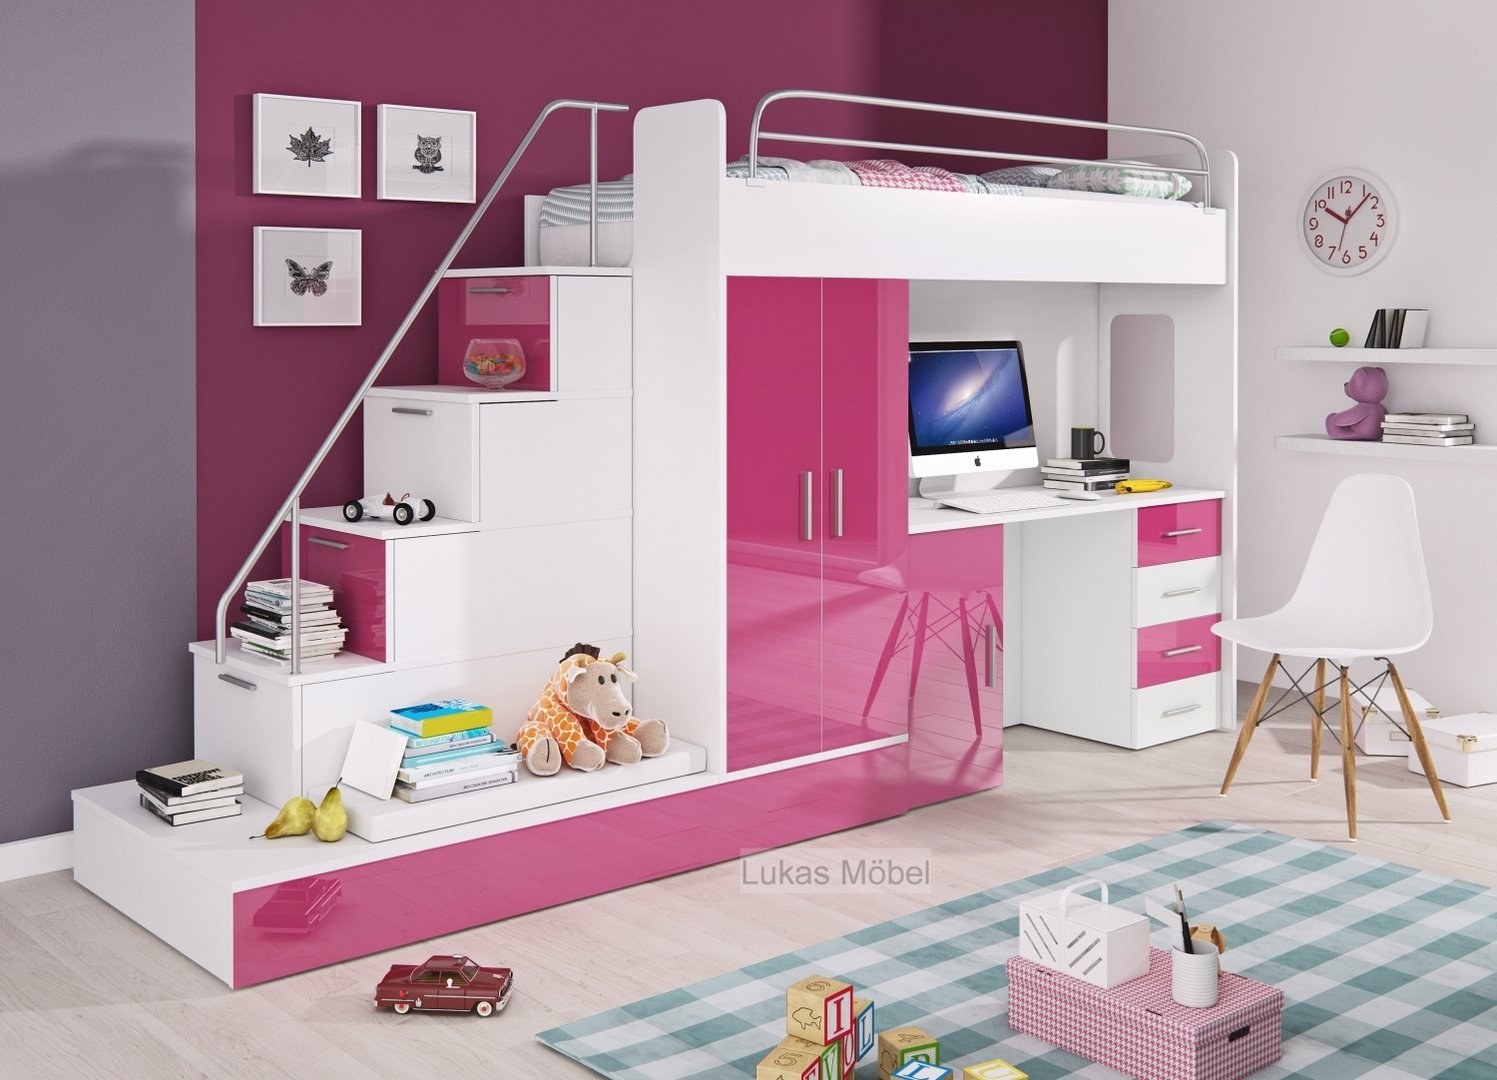 Etagenbett Rosa : Mdf platten kinder bett volle etagenbett mit treppen schublade